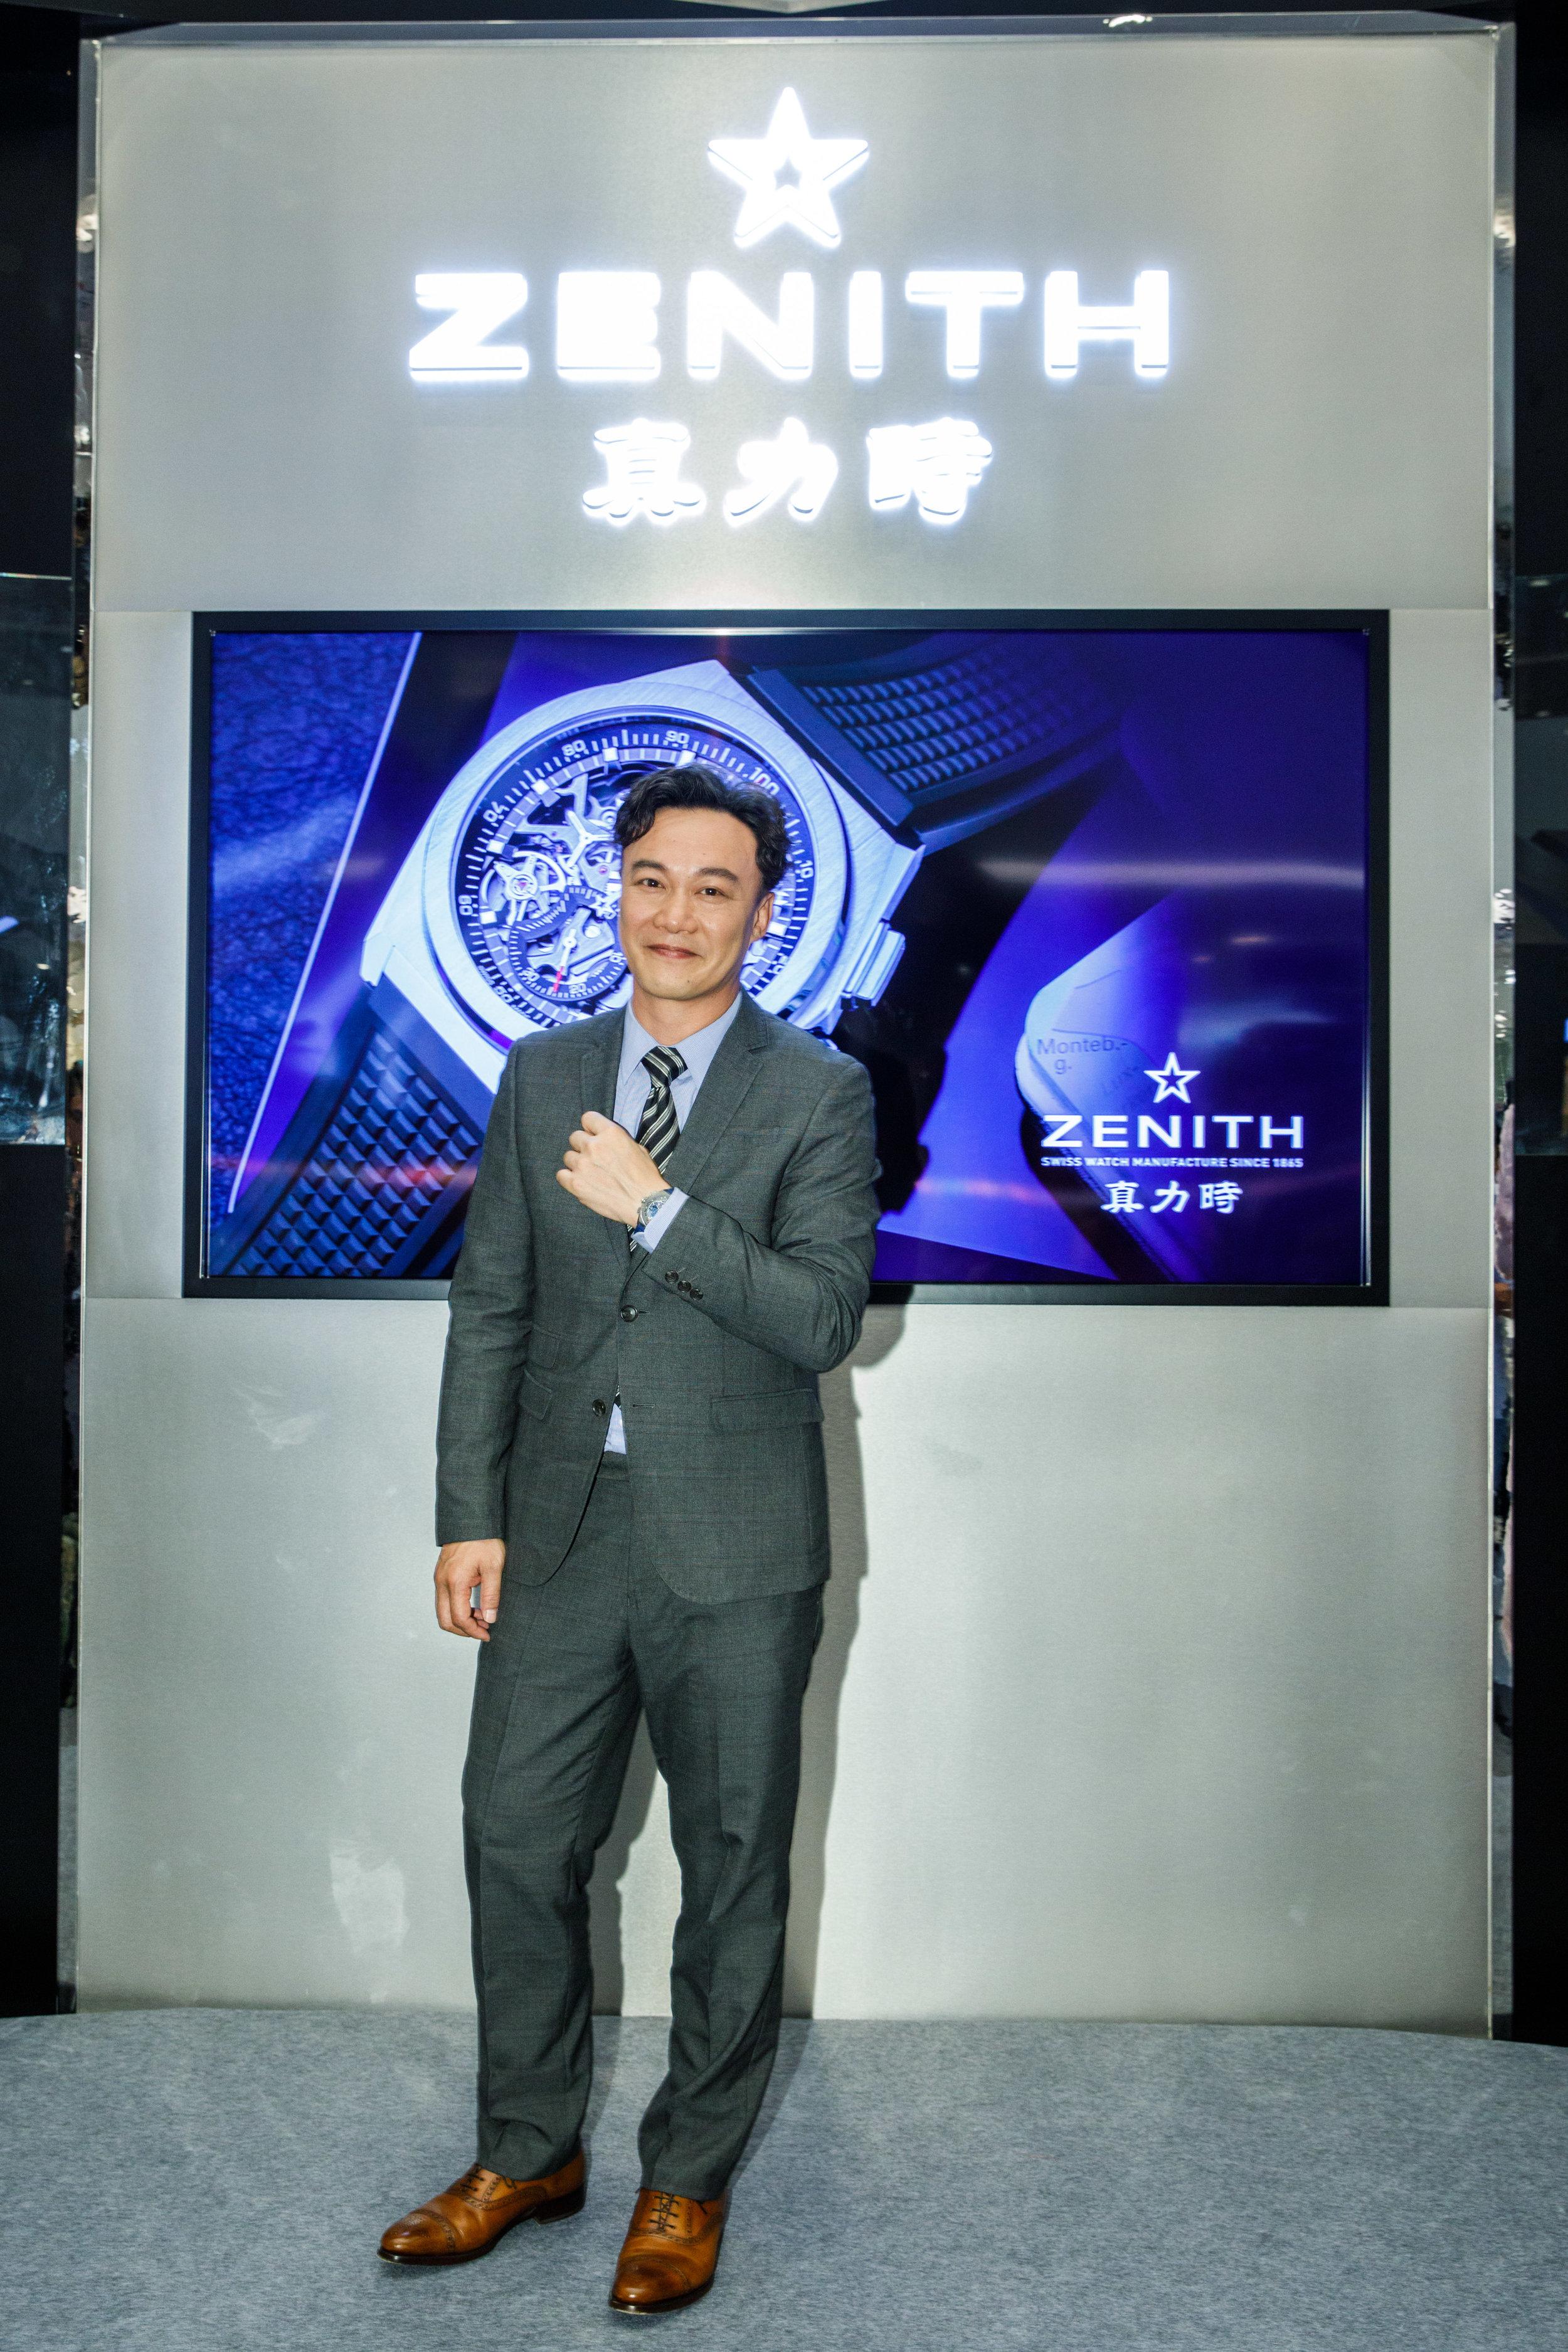 Zenith Eason Chan Event. Hong Kong. 2018